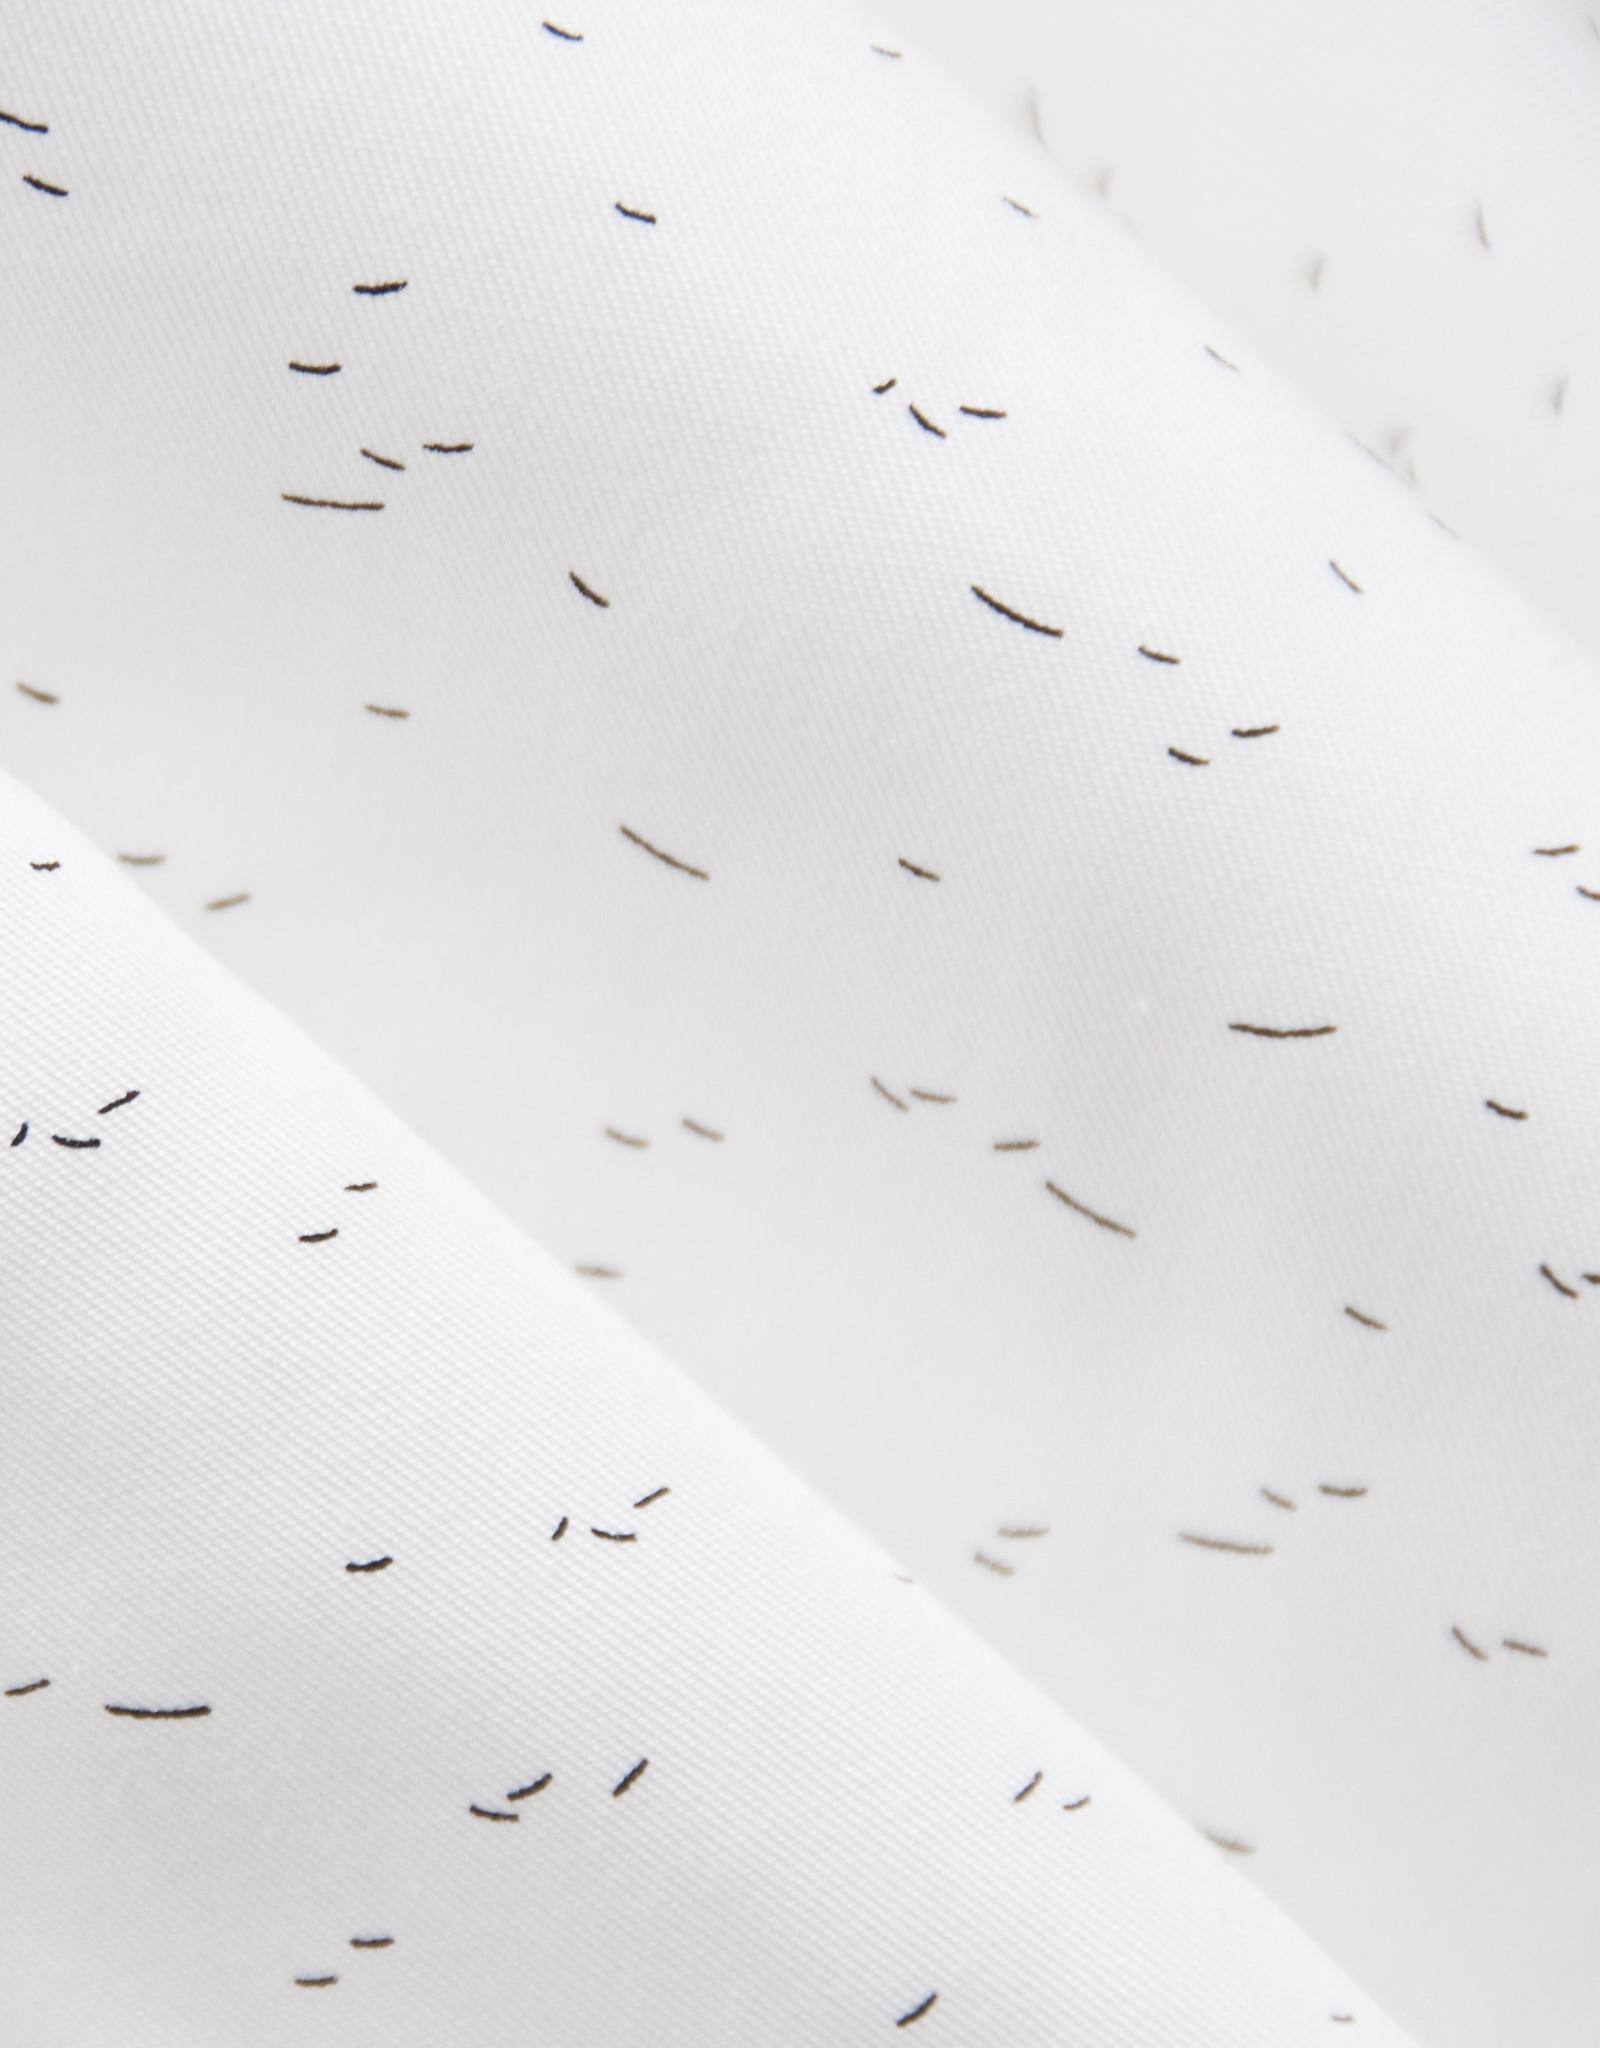 Les Rêves d'Anaïs  Muziekmobiel twirling sky